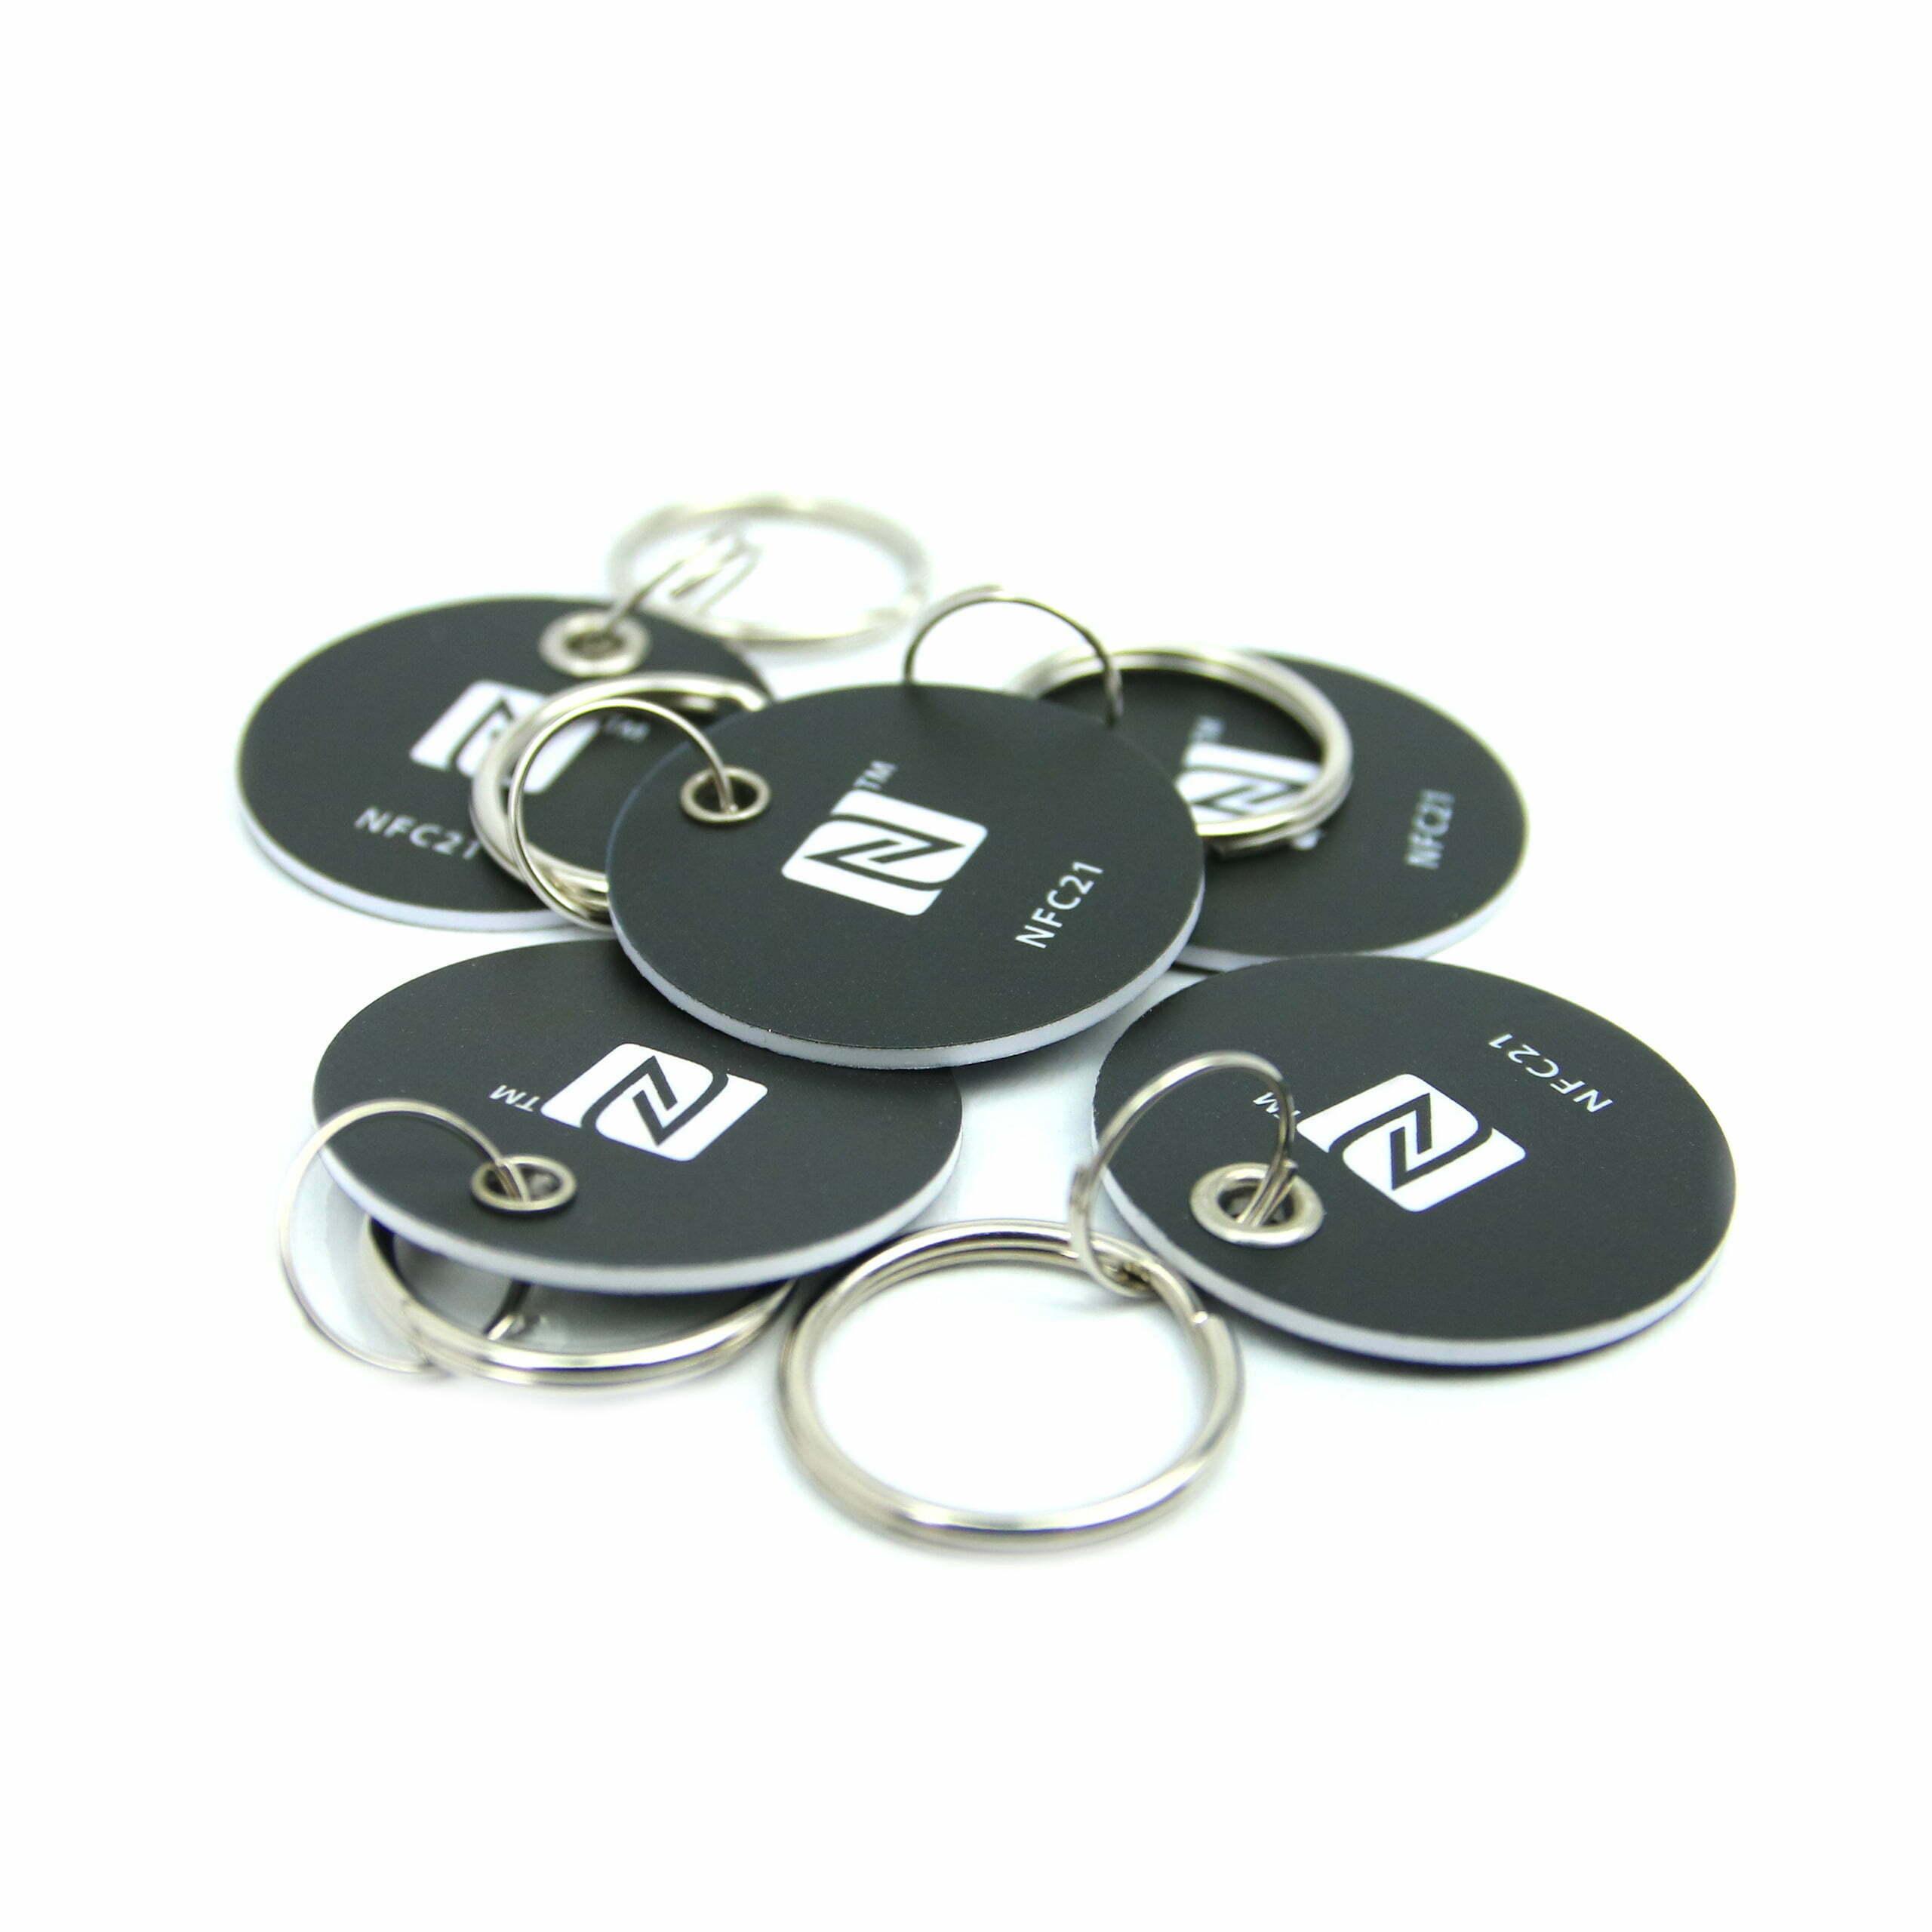 NFC Key Card, 30 mm, plus 213, 180 octet